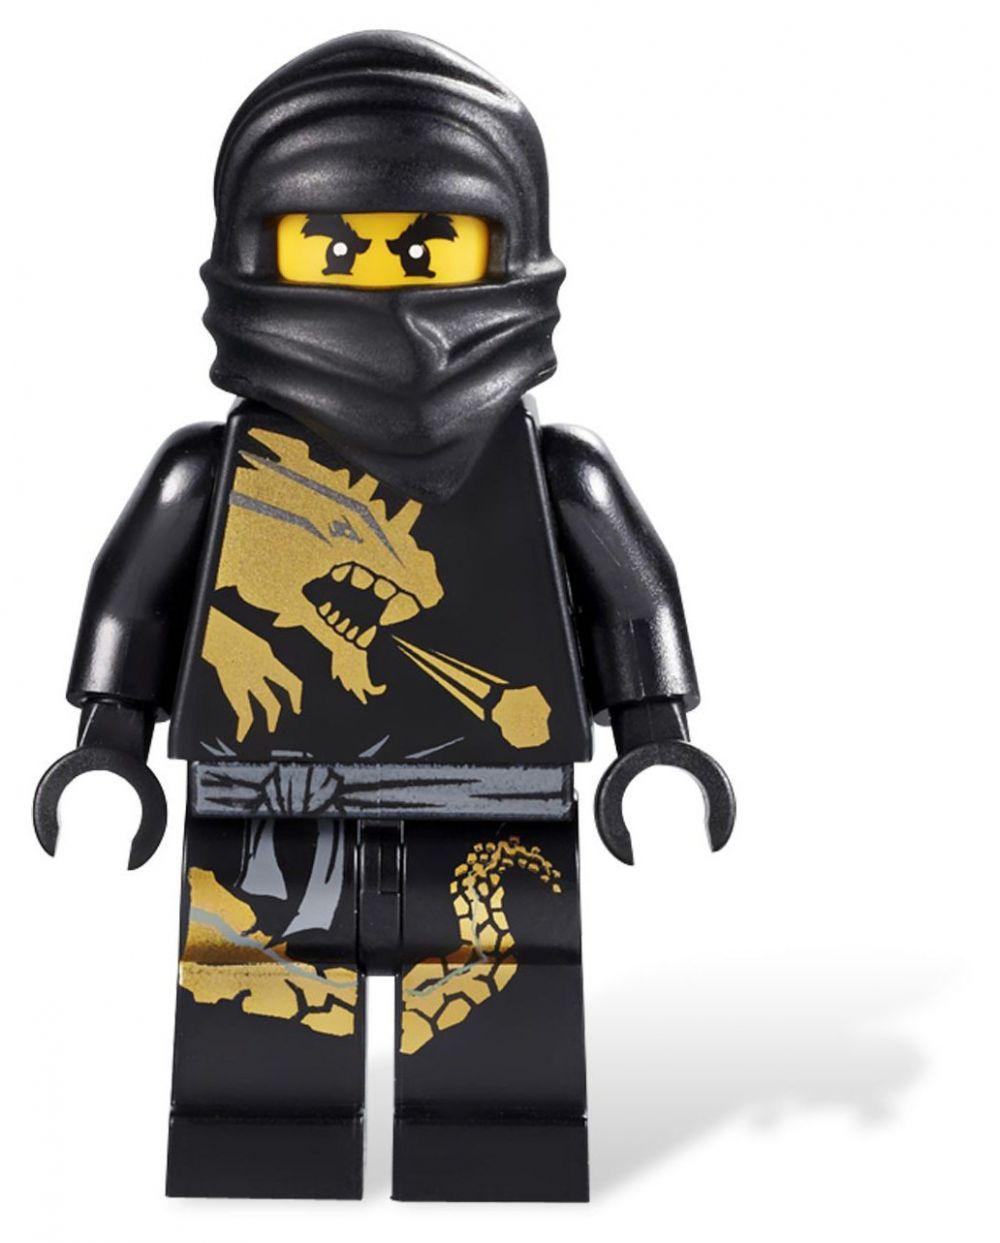 Lego ninjago 2520 pas cher l 39 ar ne de combat ninjago - Personnage ninjago lego ...